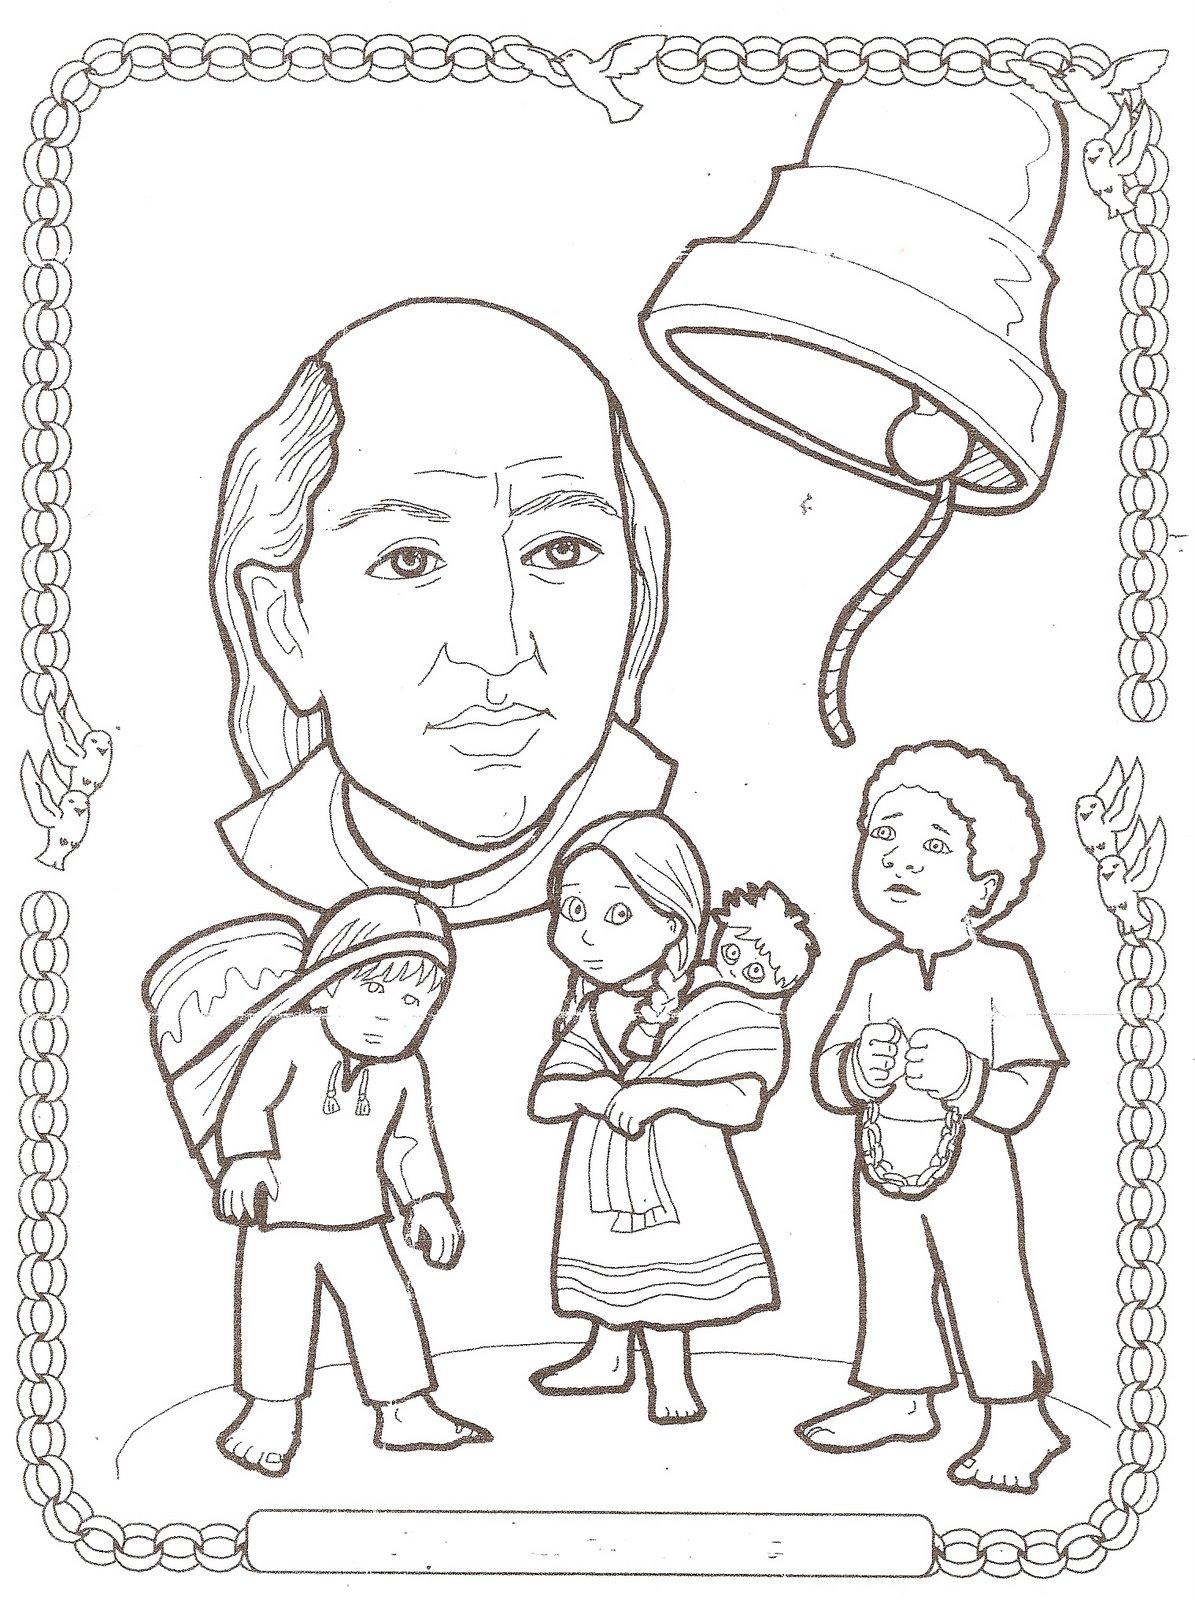 Homeschooling: Dibujos del 15 de septiembre